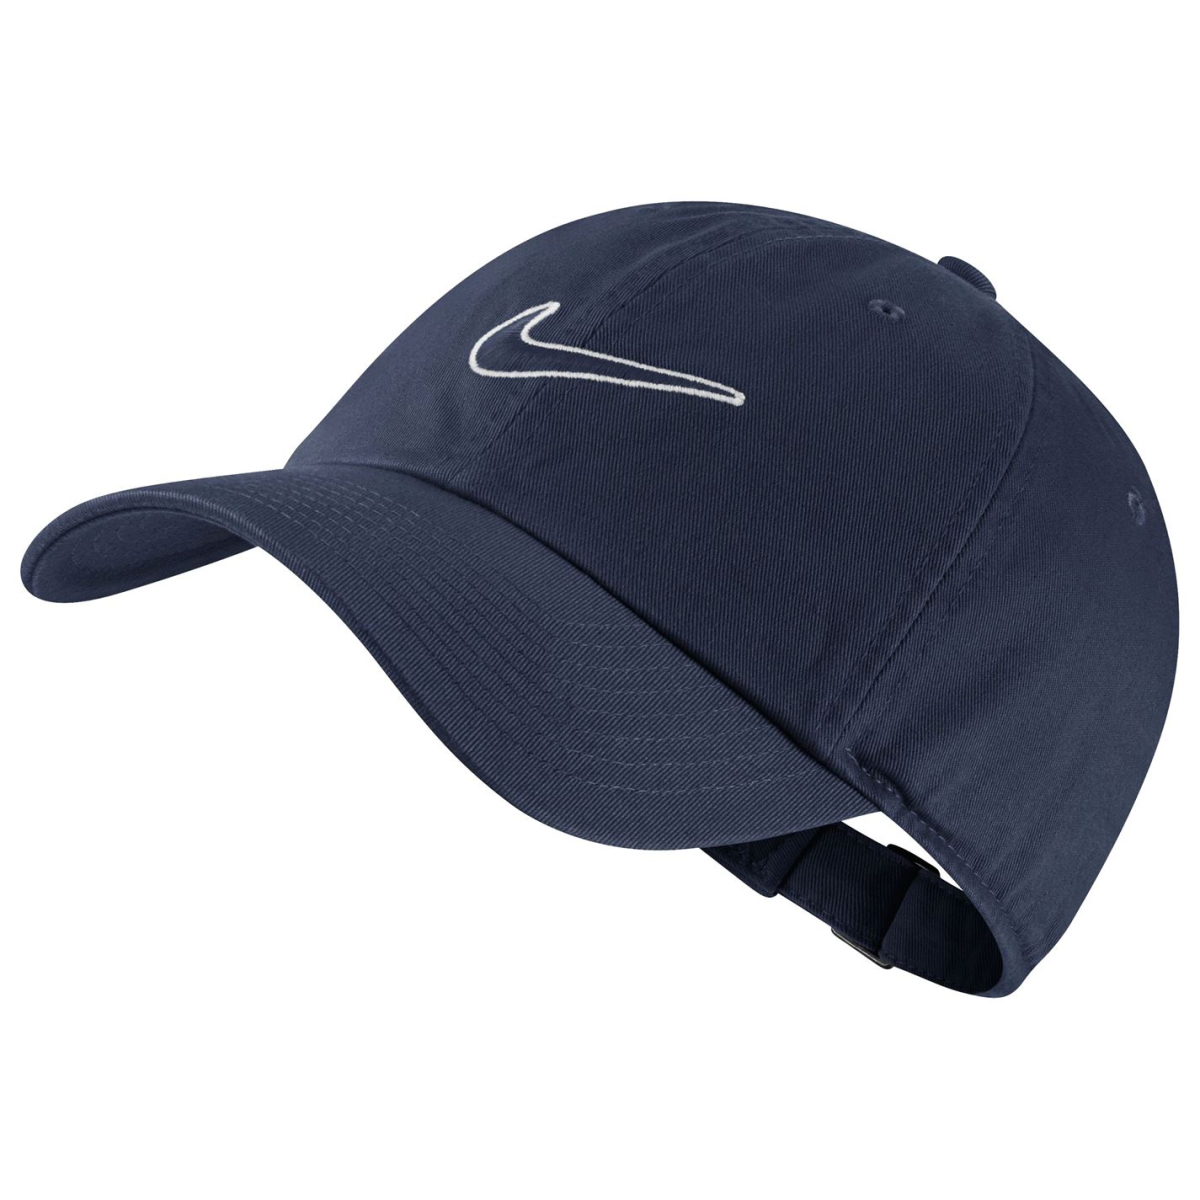 Nike Swoosh Kappe Baseball Caps Basecap Herren Golf 1018